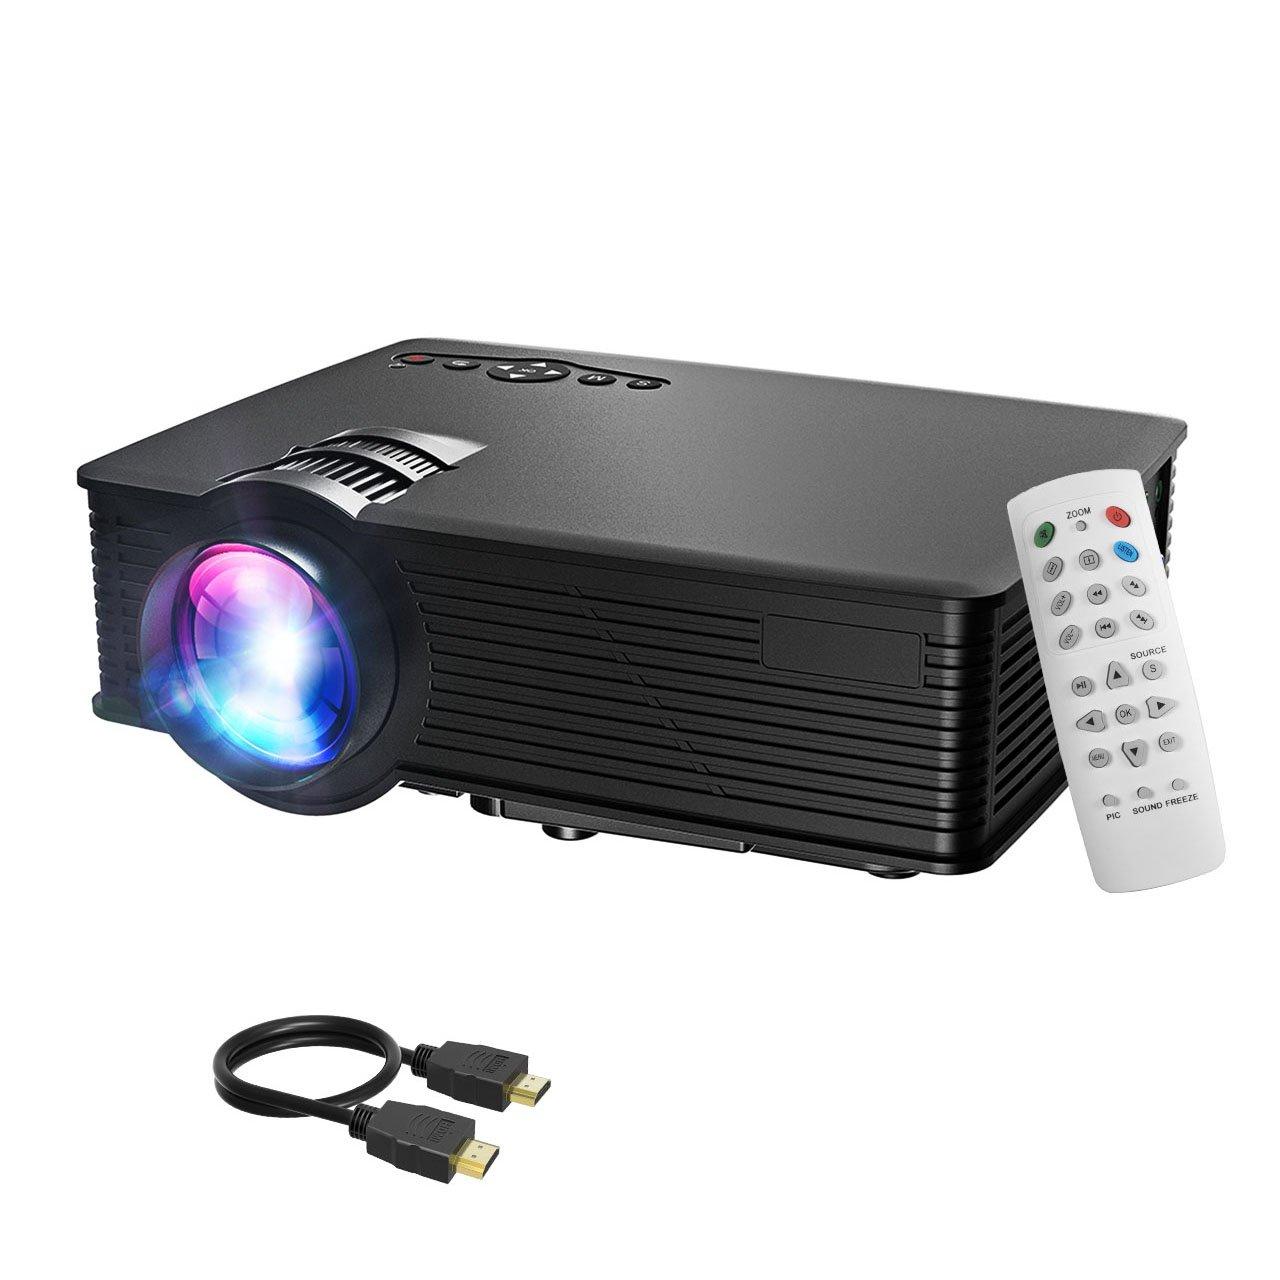 LCD proyector, Mpow LCD Projector 1200lúmenes LED Mini proyector Home Cinema portátil Multimedia cine en casa con USB SD HDMI...